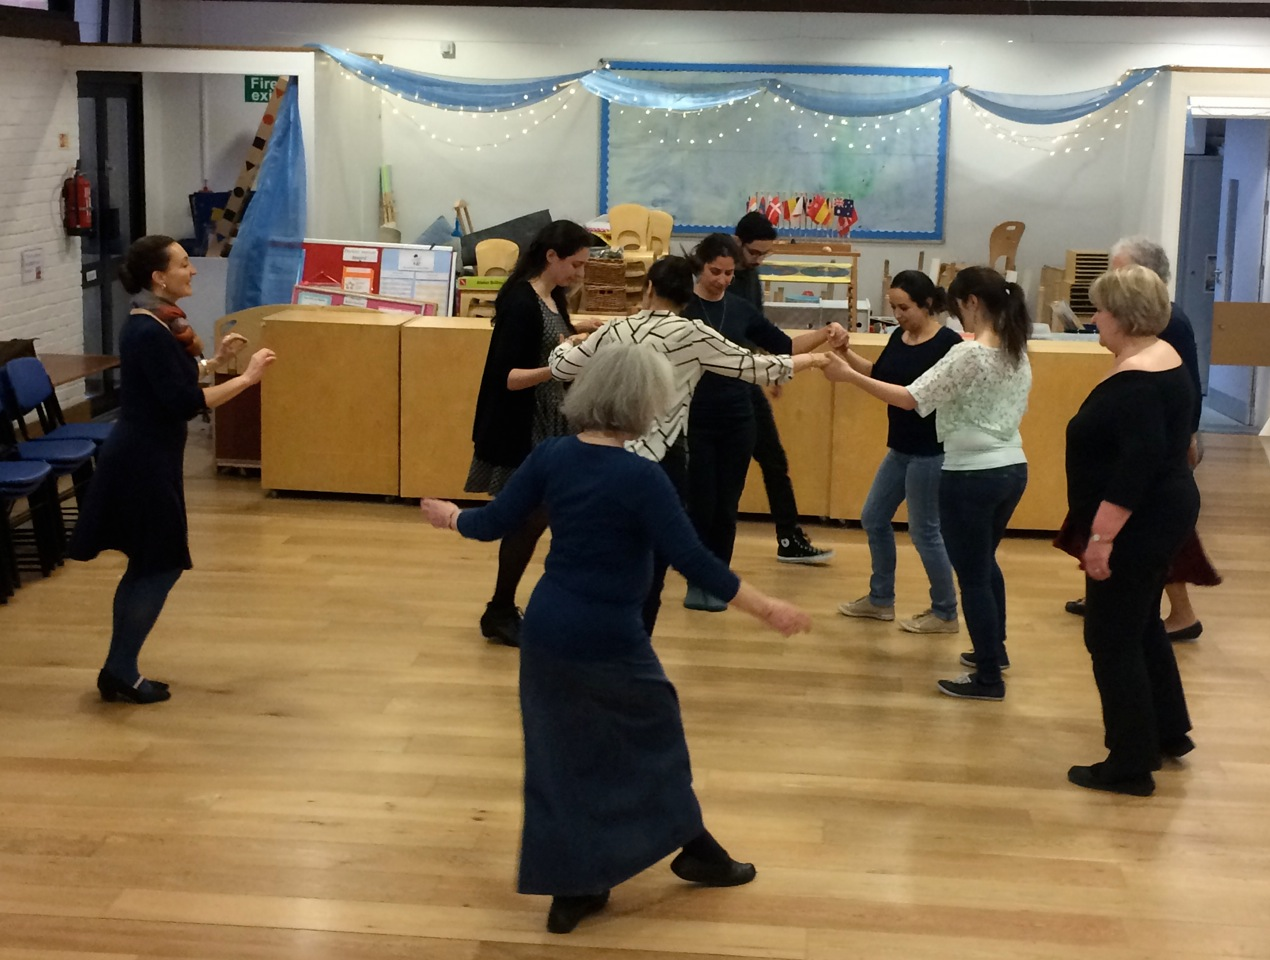 170401Language-dance-workshop-photo01-C.jpeg